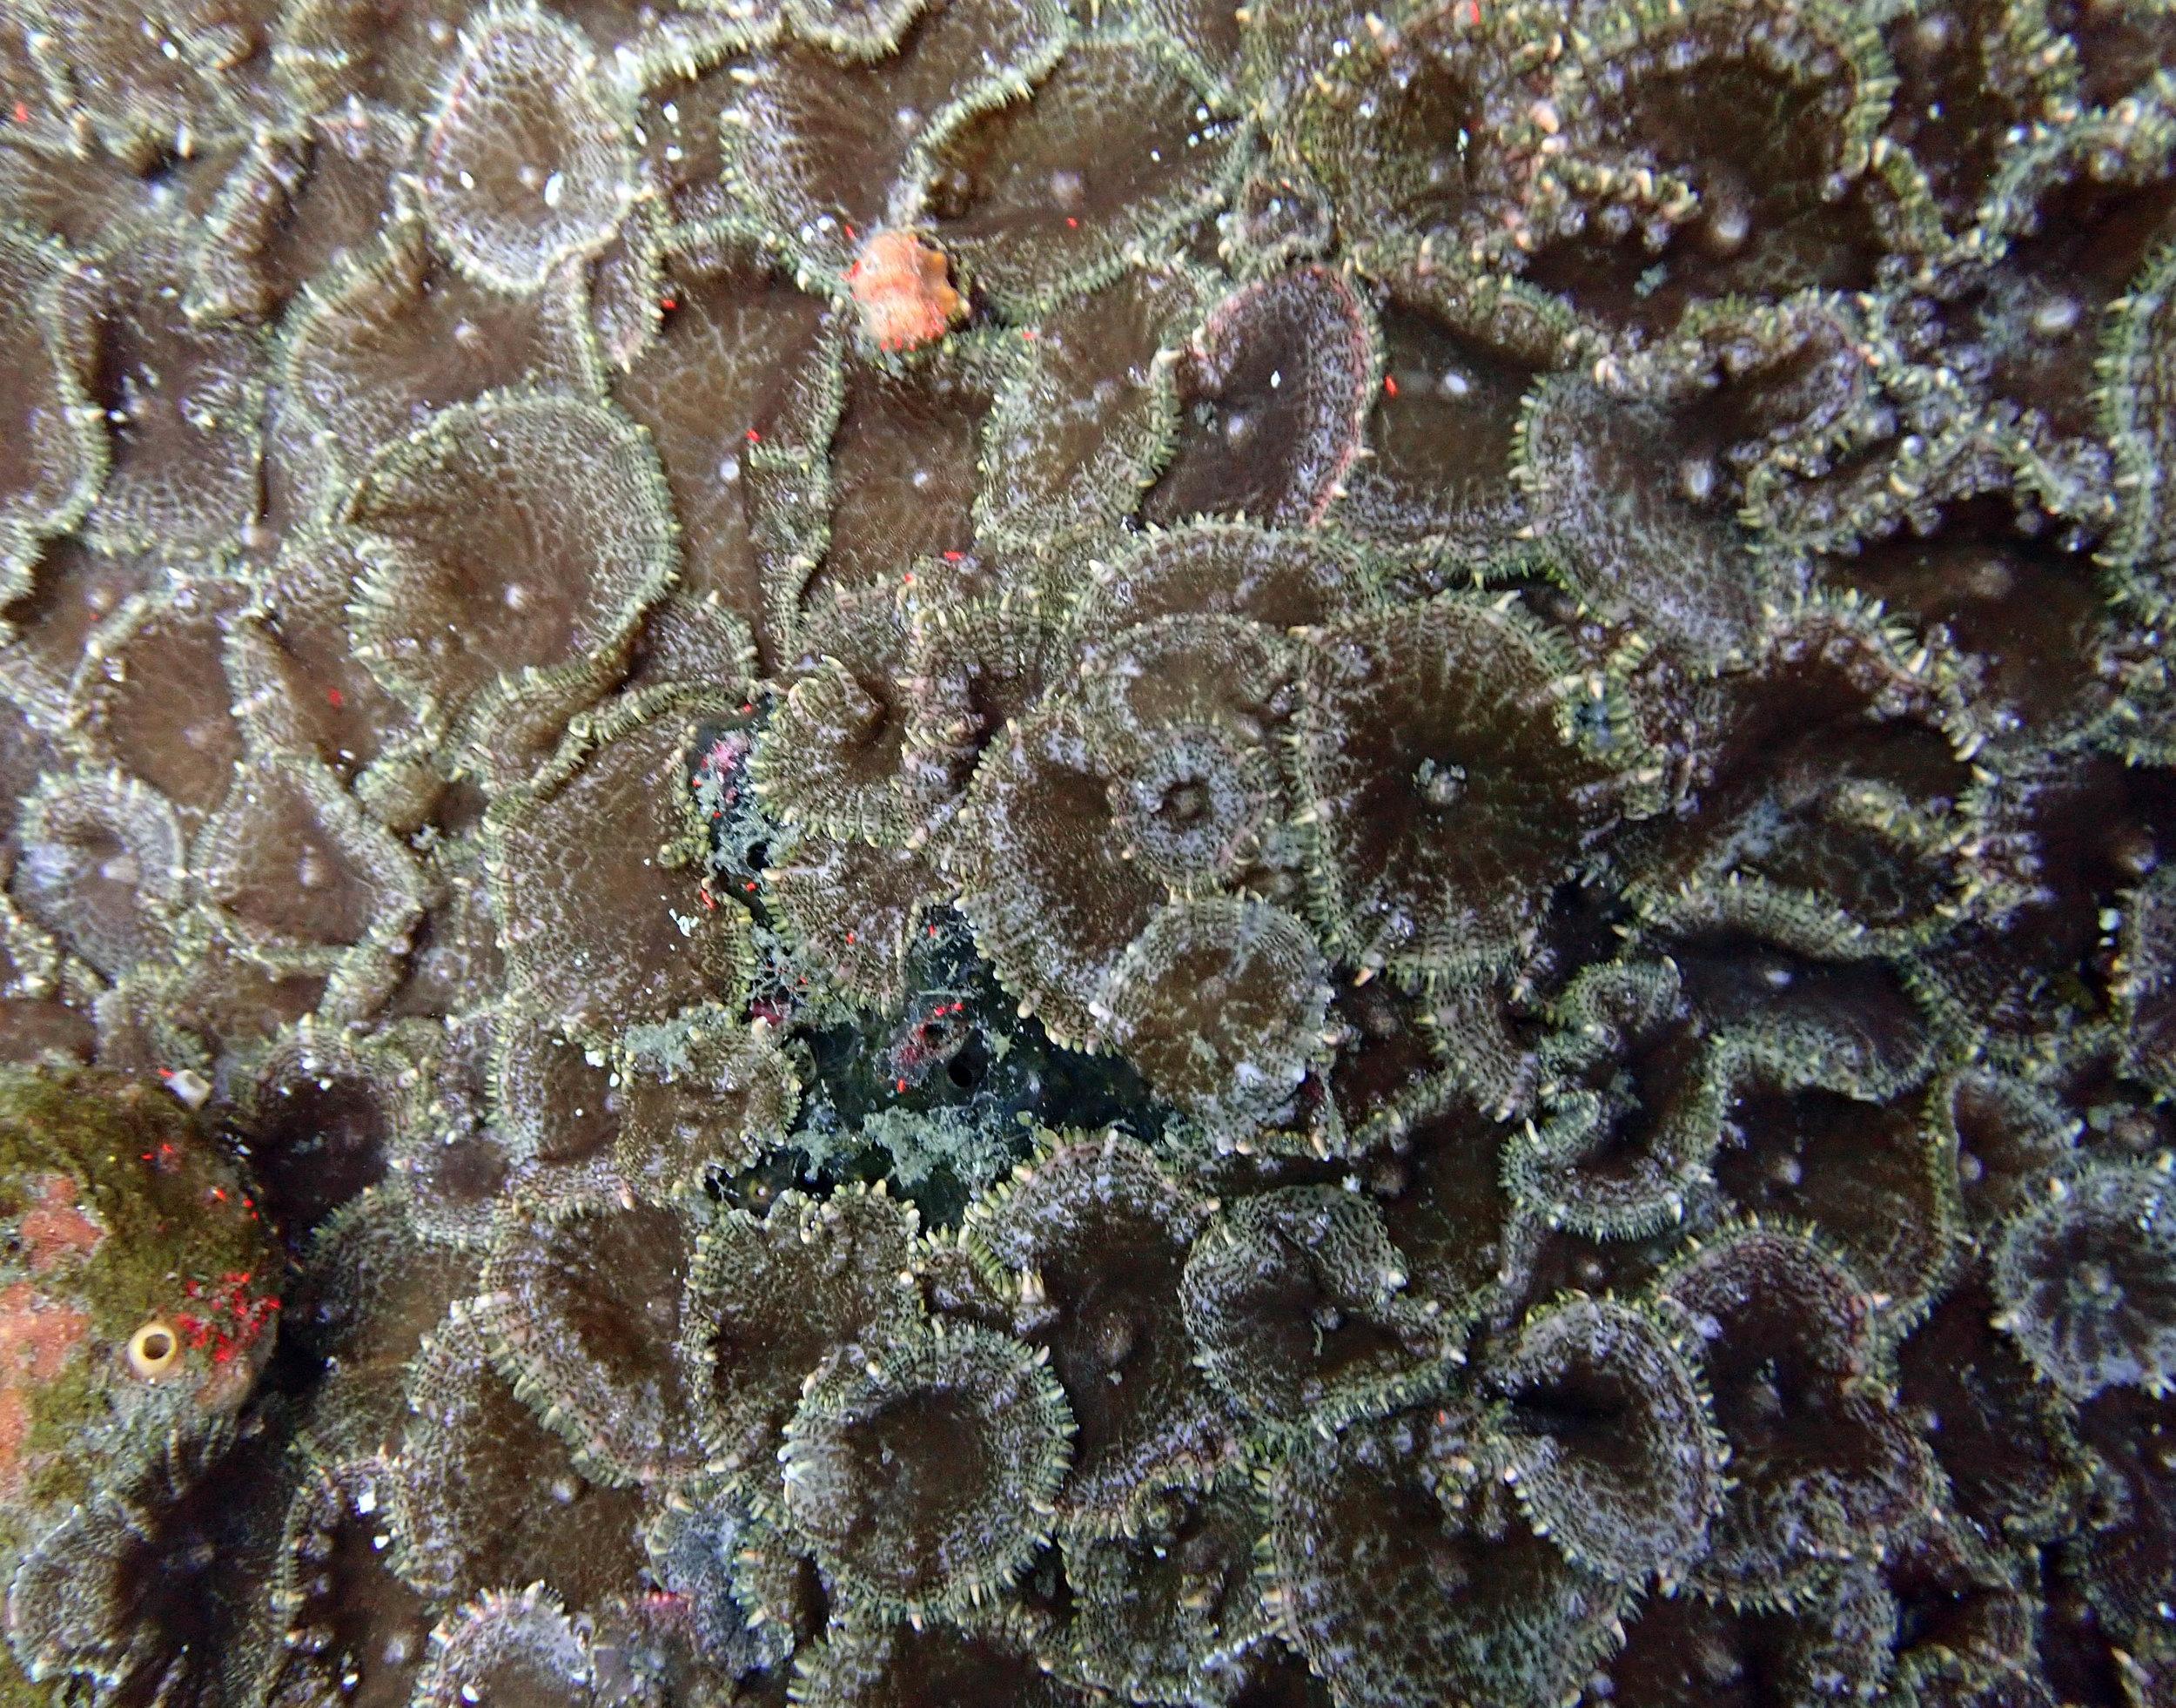 colonial corallimorph.jpg